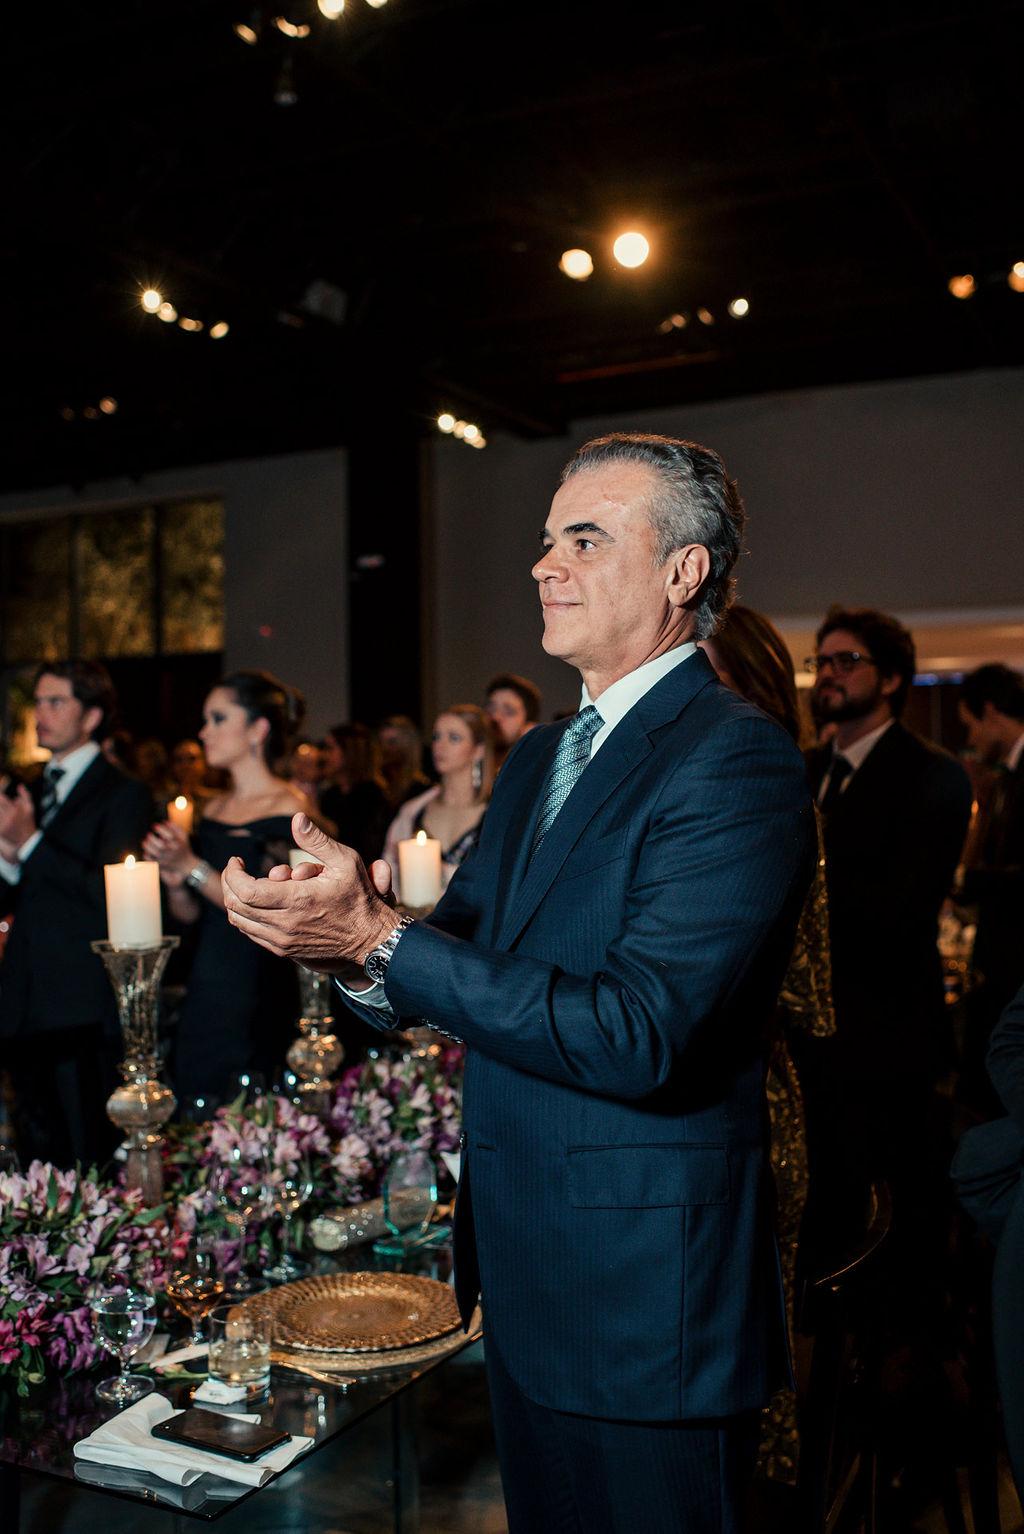 Dr. Henrique Moraes Salvador Silva Credito: Lecanovo BrazilFoundation II Gala Minas Gerais Belo Horizonte Filantropia 2019